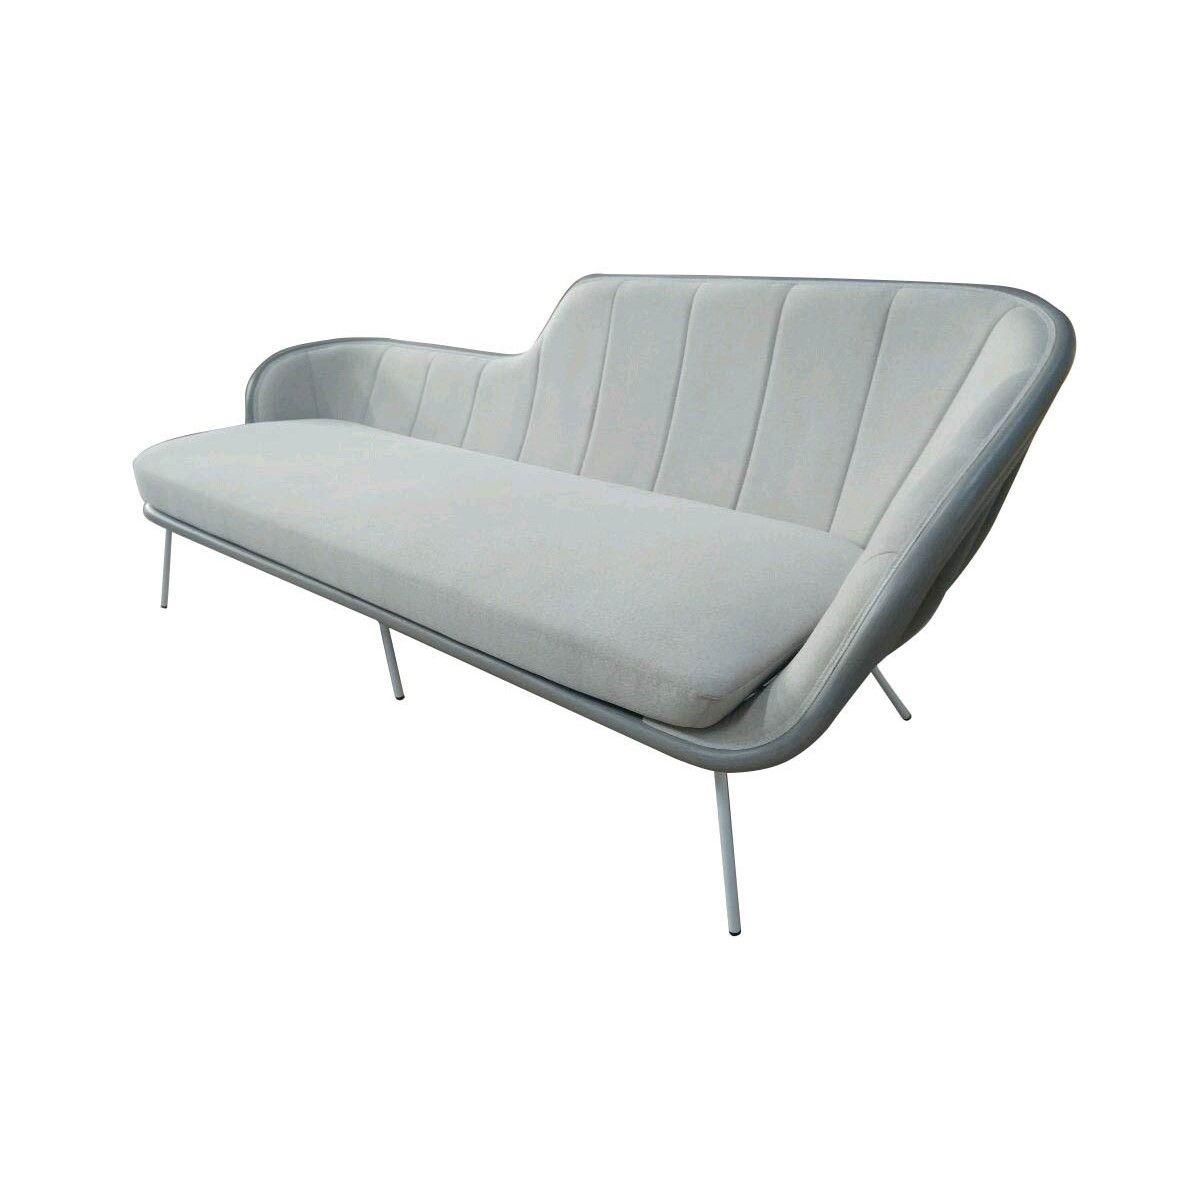 1195 Bend Sofa - Grey Fabric - Seating - Selamat